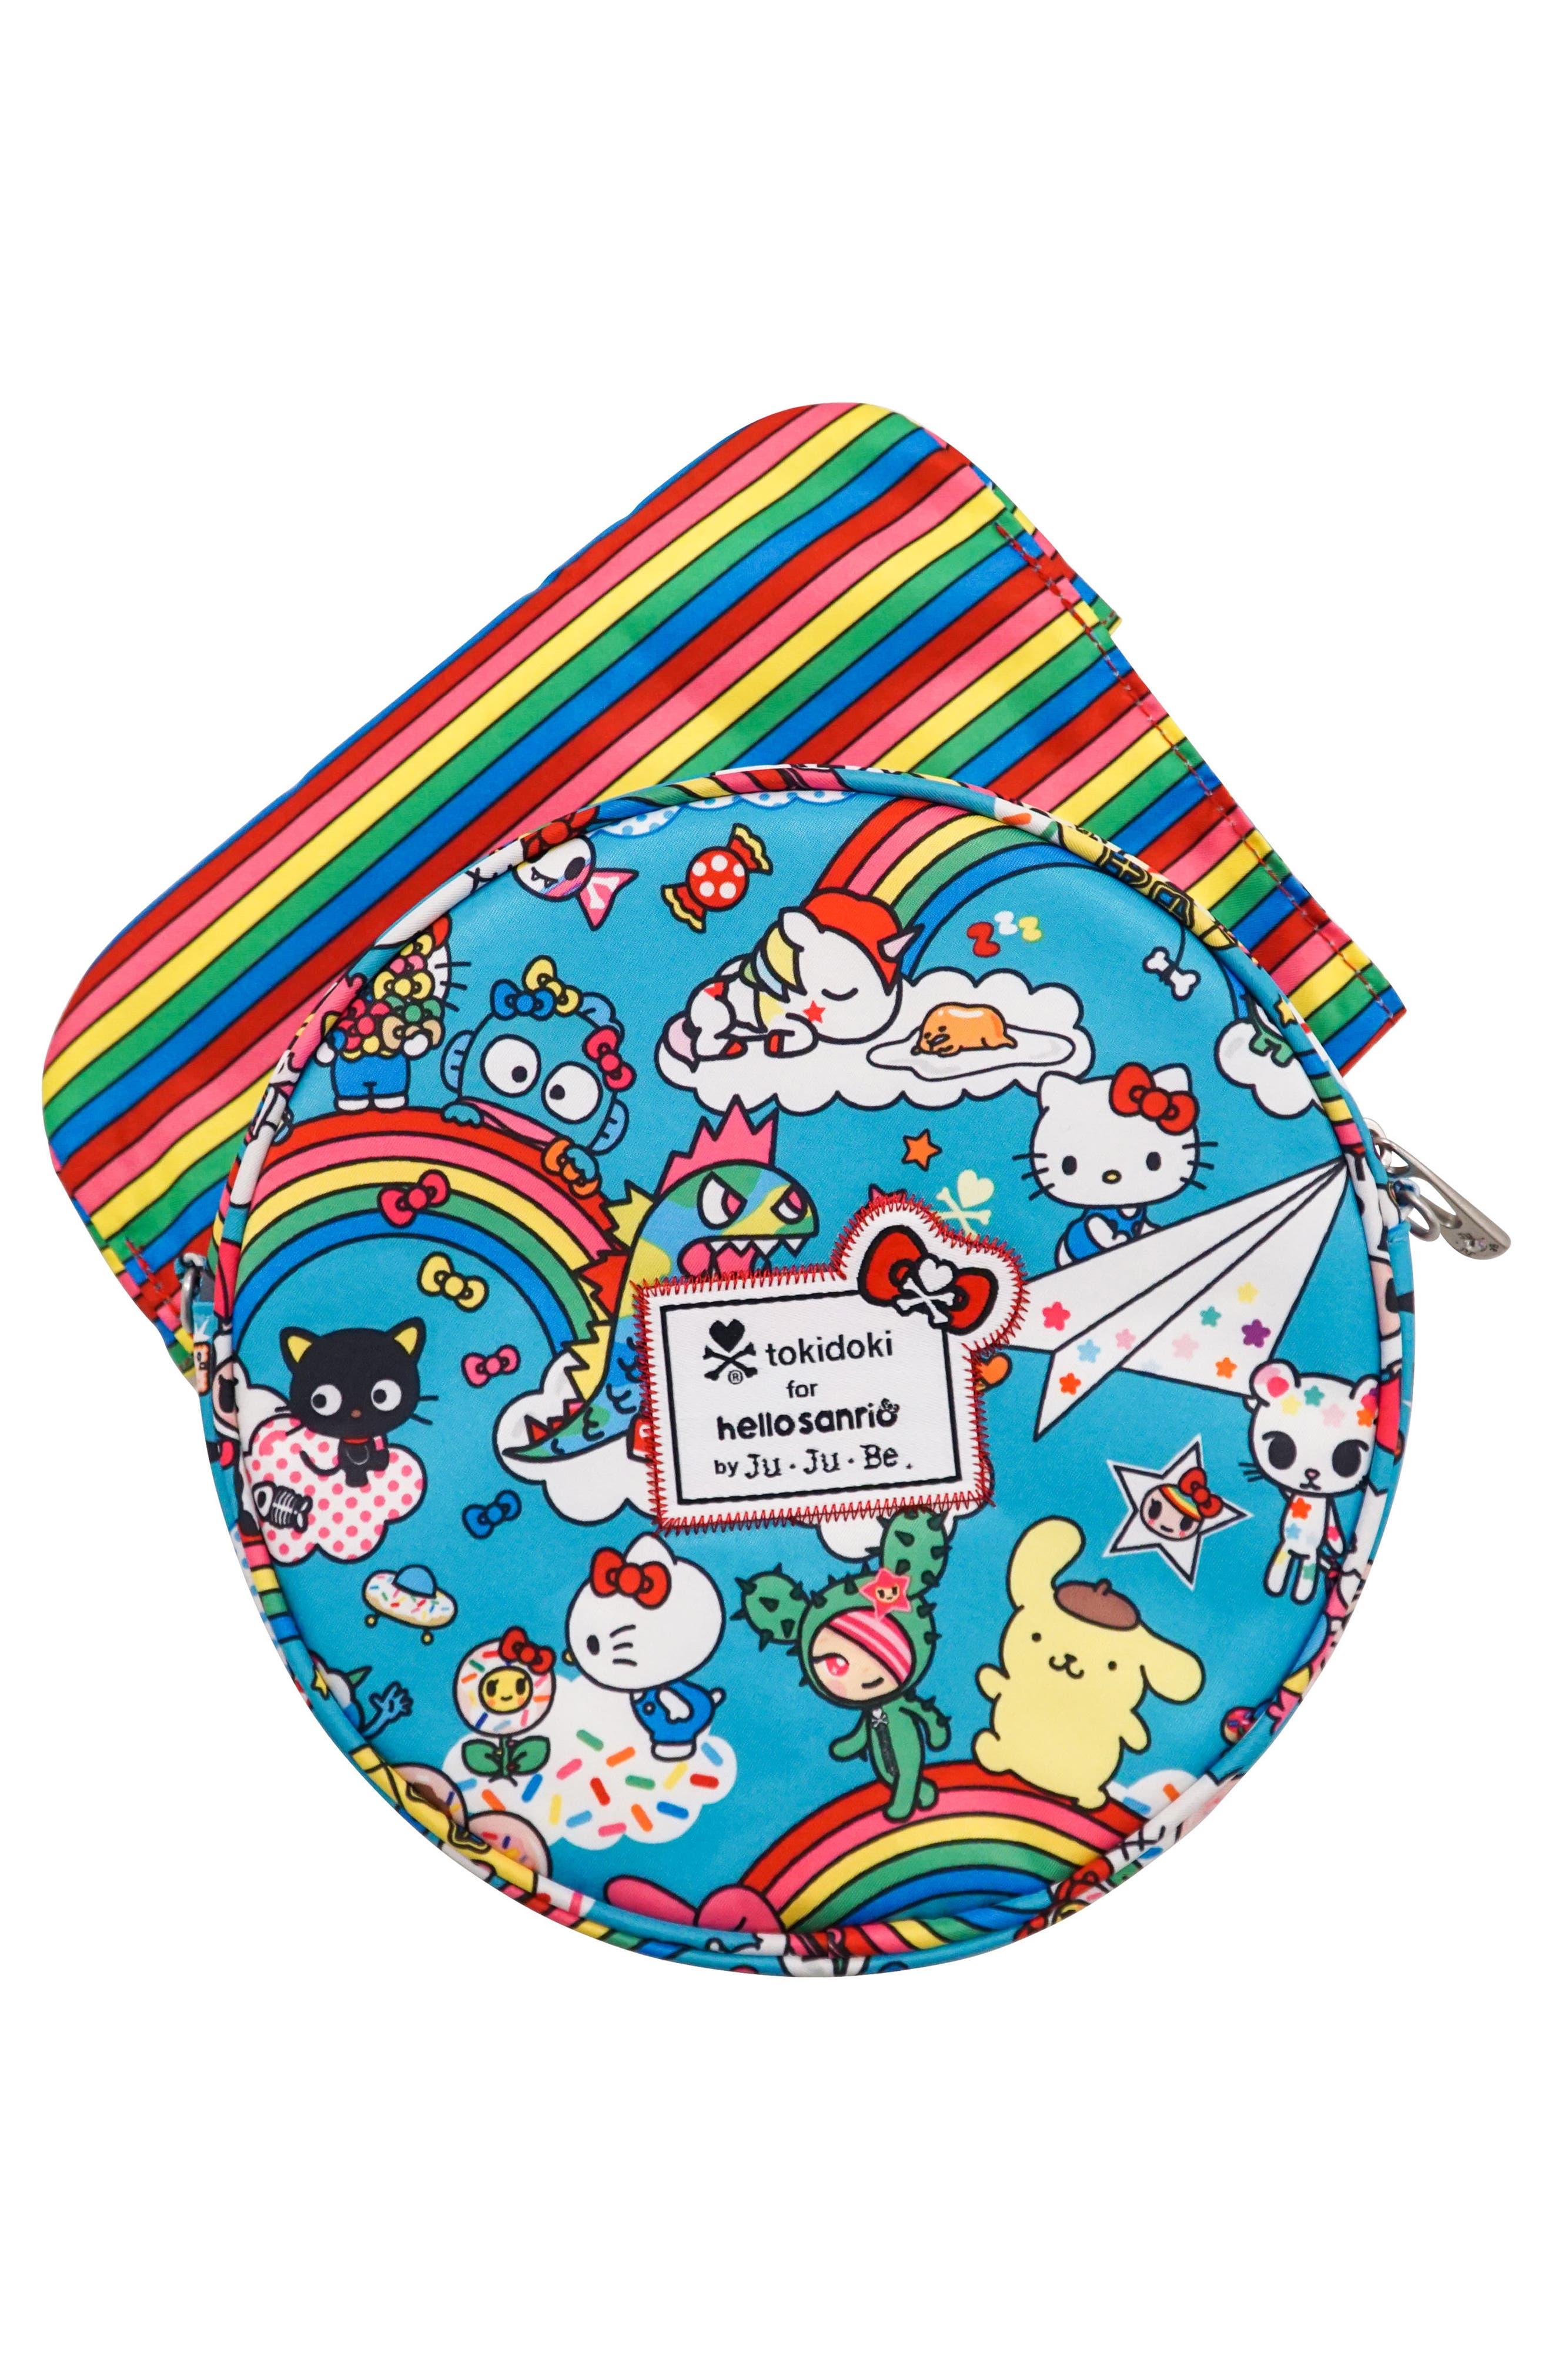 x tokidoki for Hello Sanrio Rainbow Dreams Be Bop Mini Bag,                             Alternate thumbnail 2, color,                             433